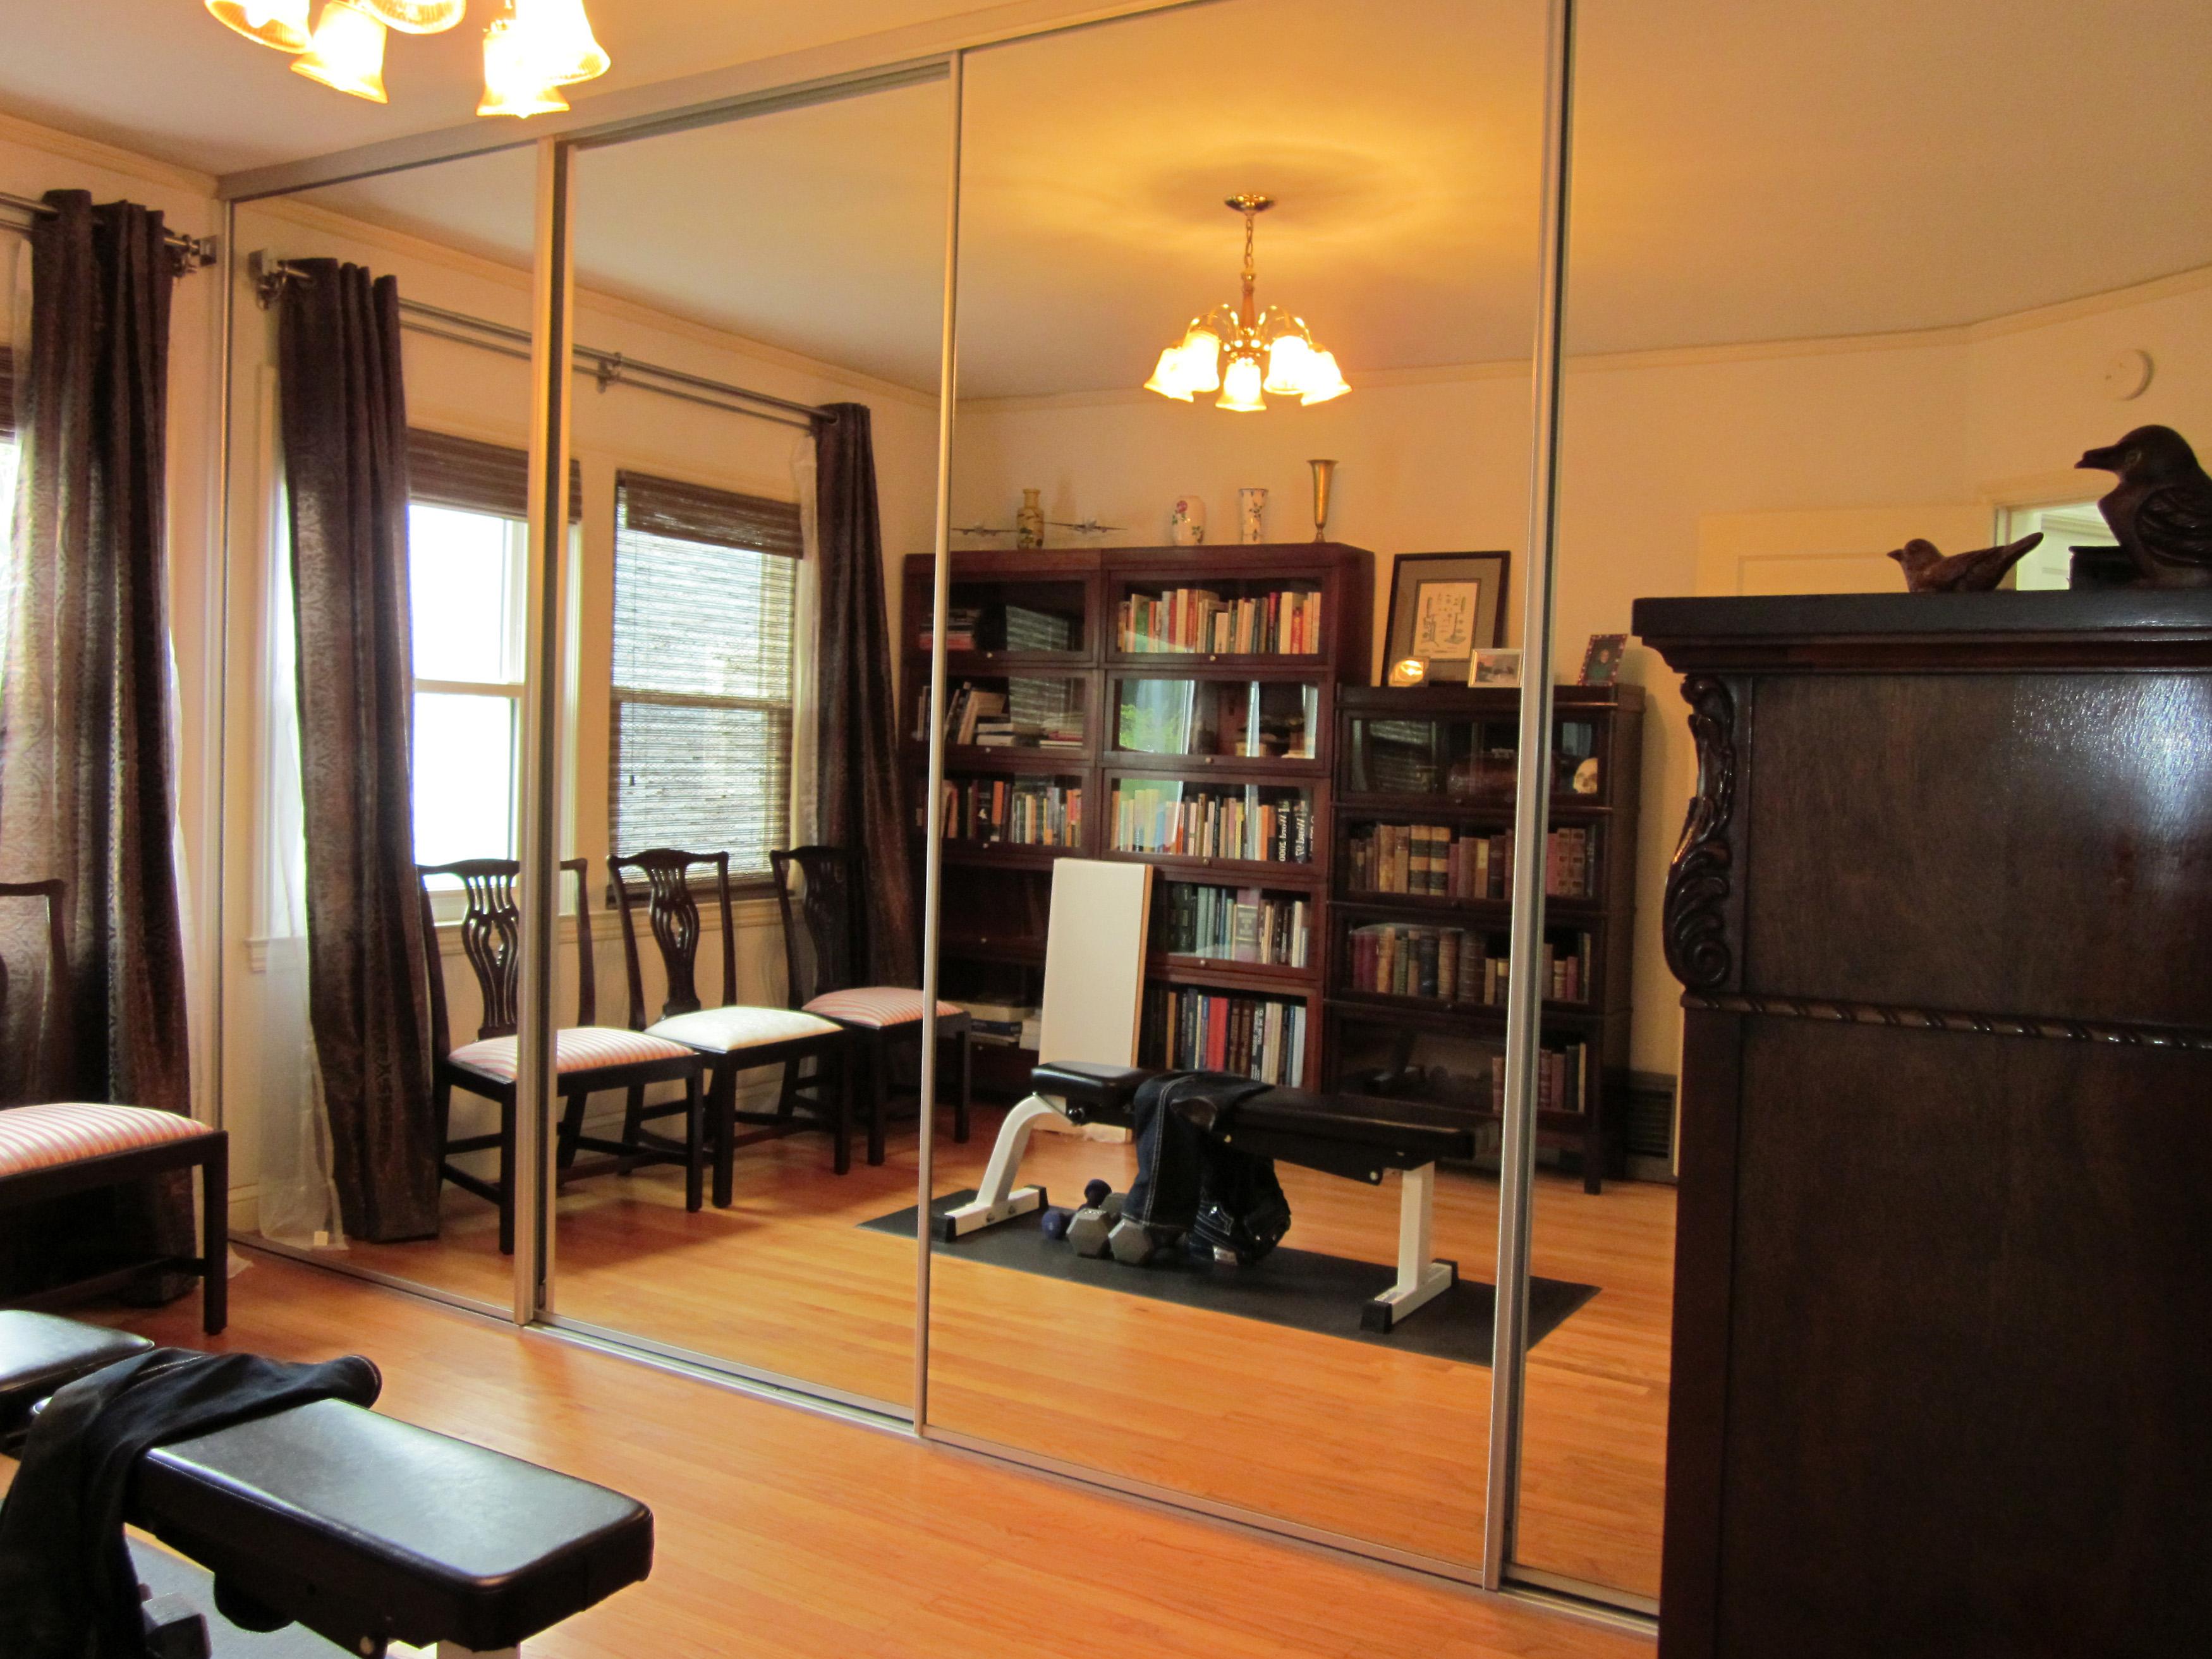 Floor To Ceiling Mirror Brings Exclusive Till Classy